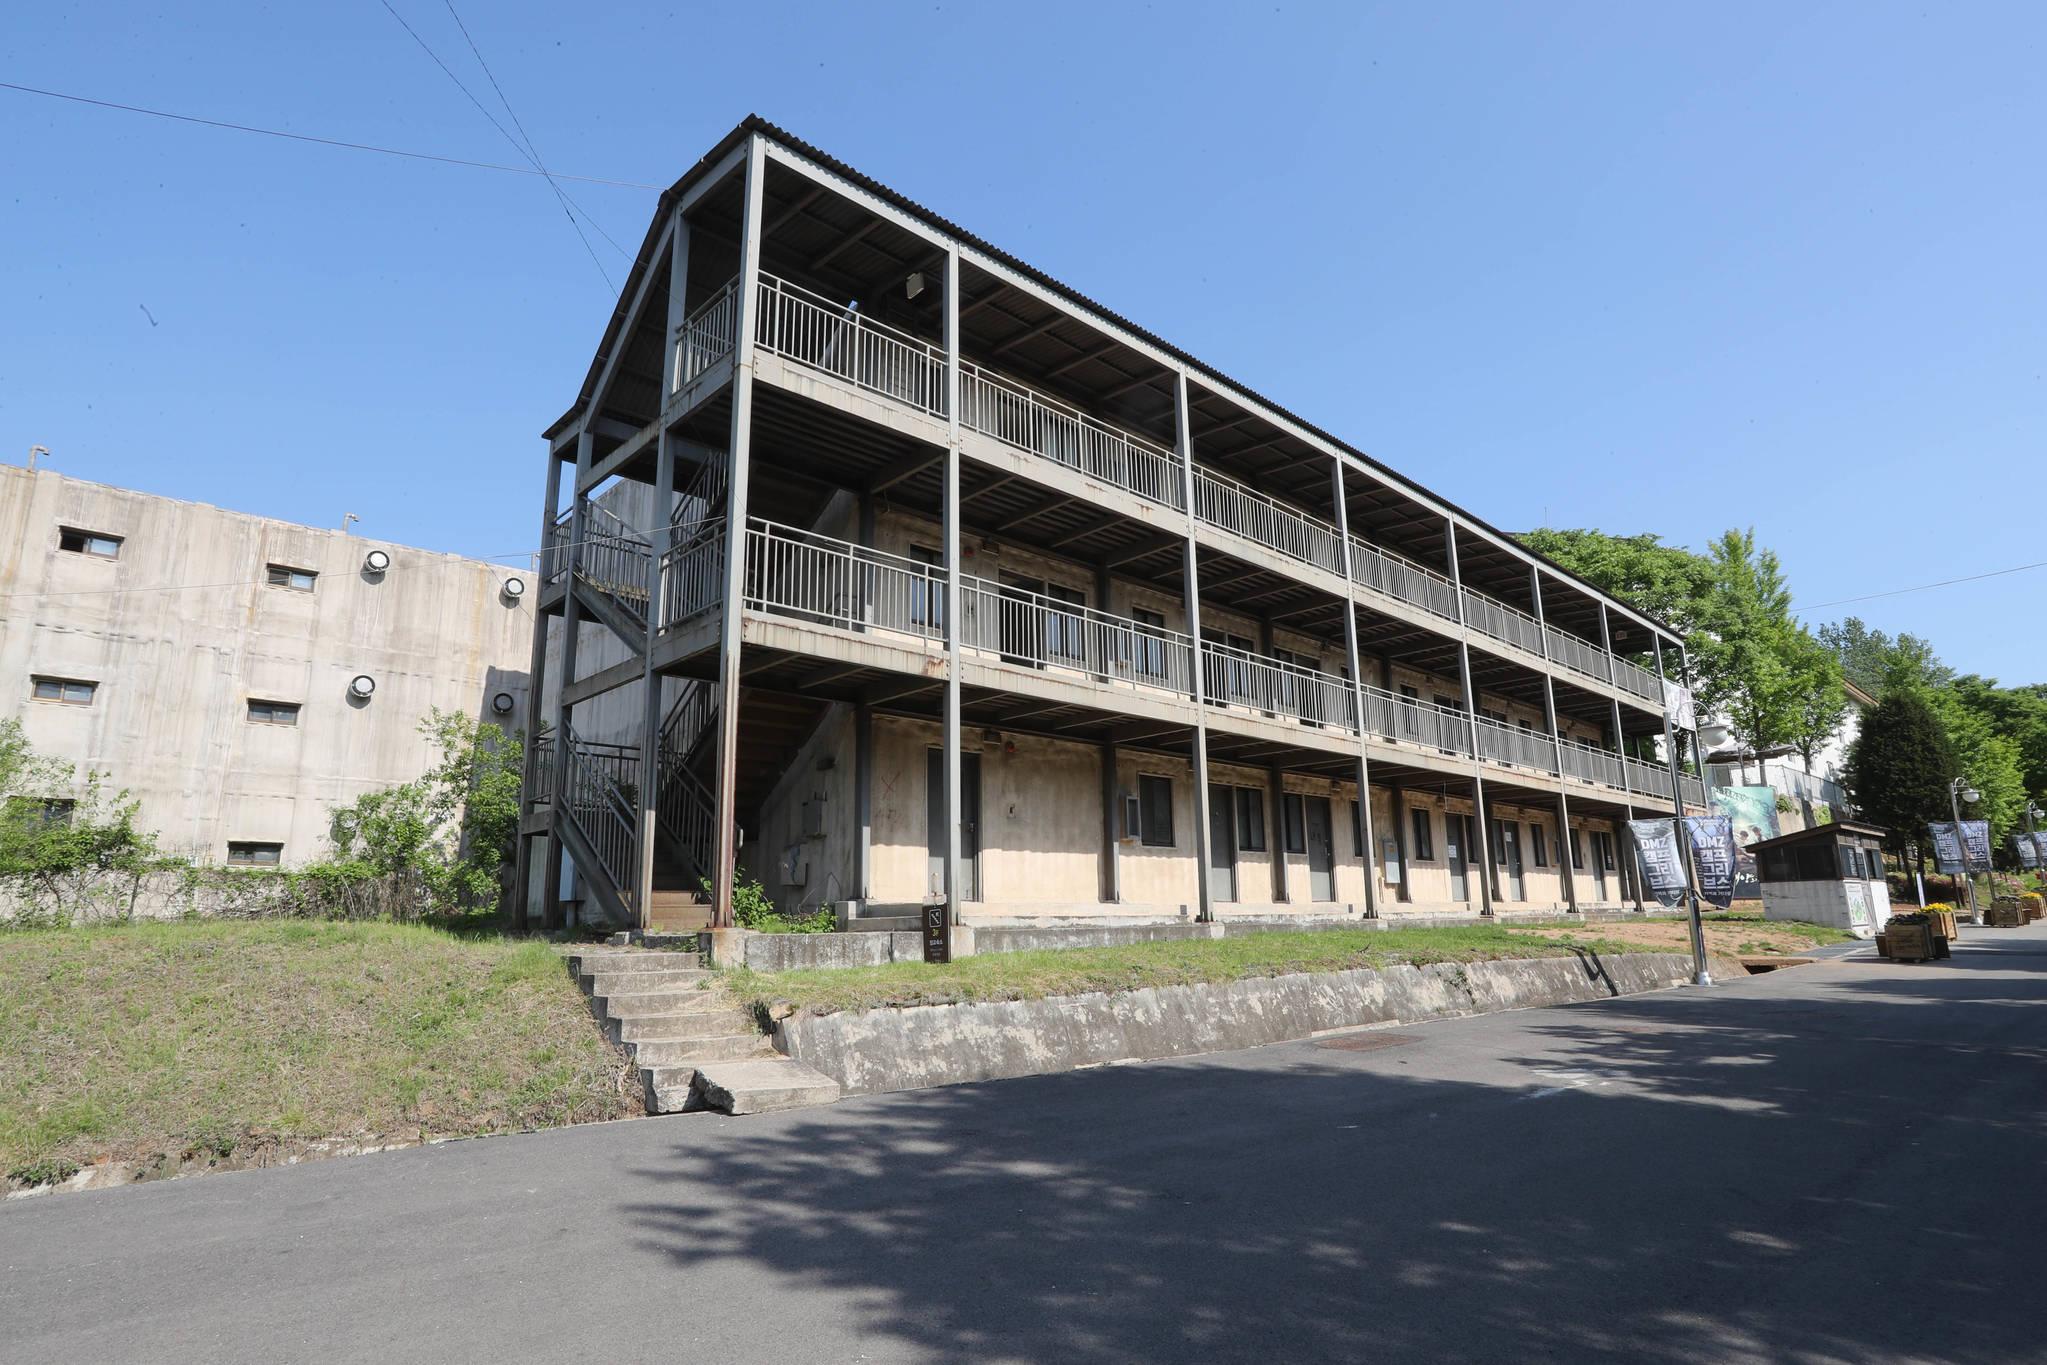 'DMZ 캠프 그리브스-기억과 기다림' 문화전시 행사가 열리는 캠프 그리브스의 한 건물. 신인섭 기자